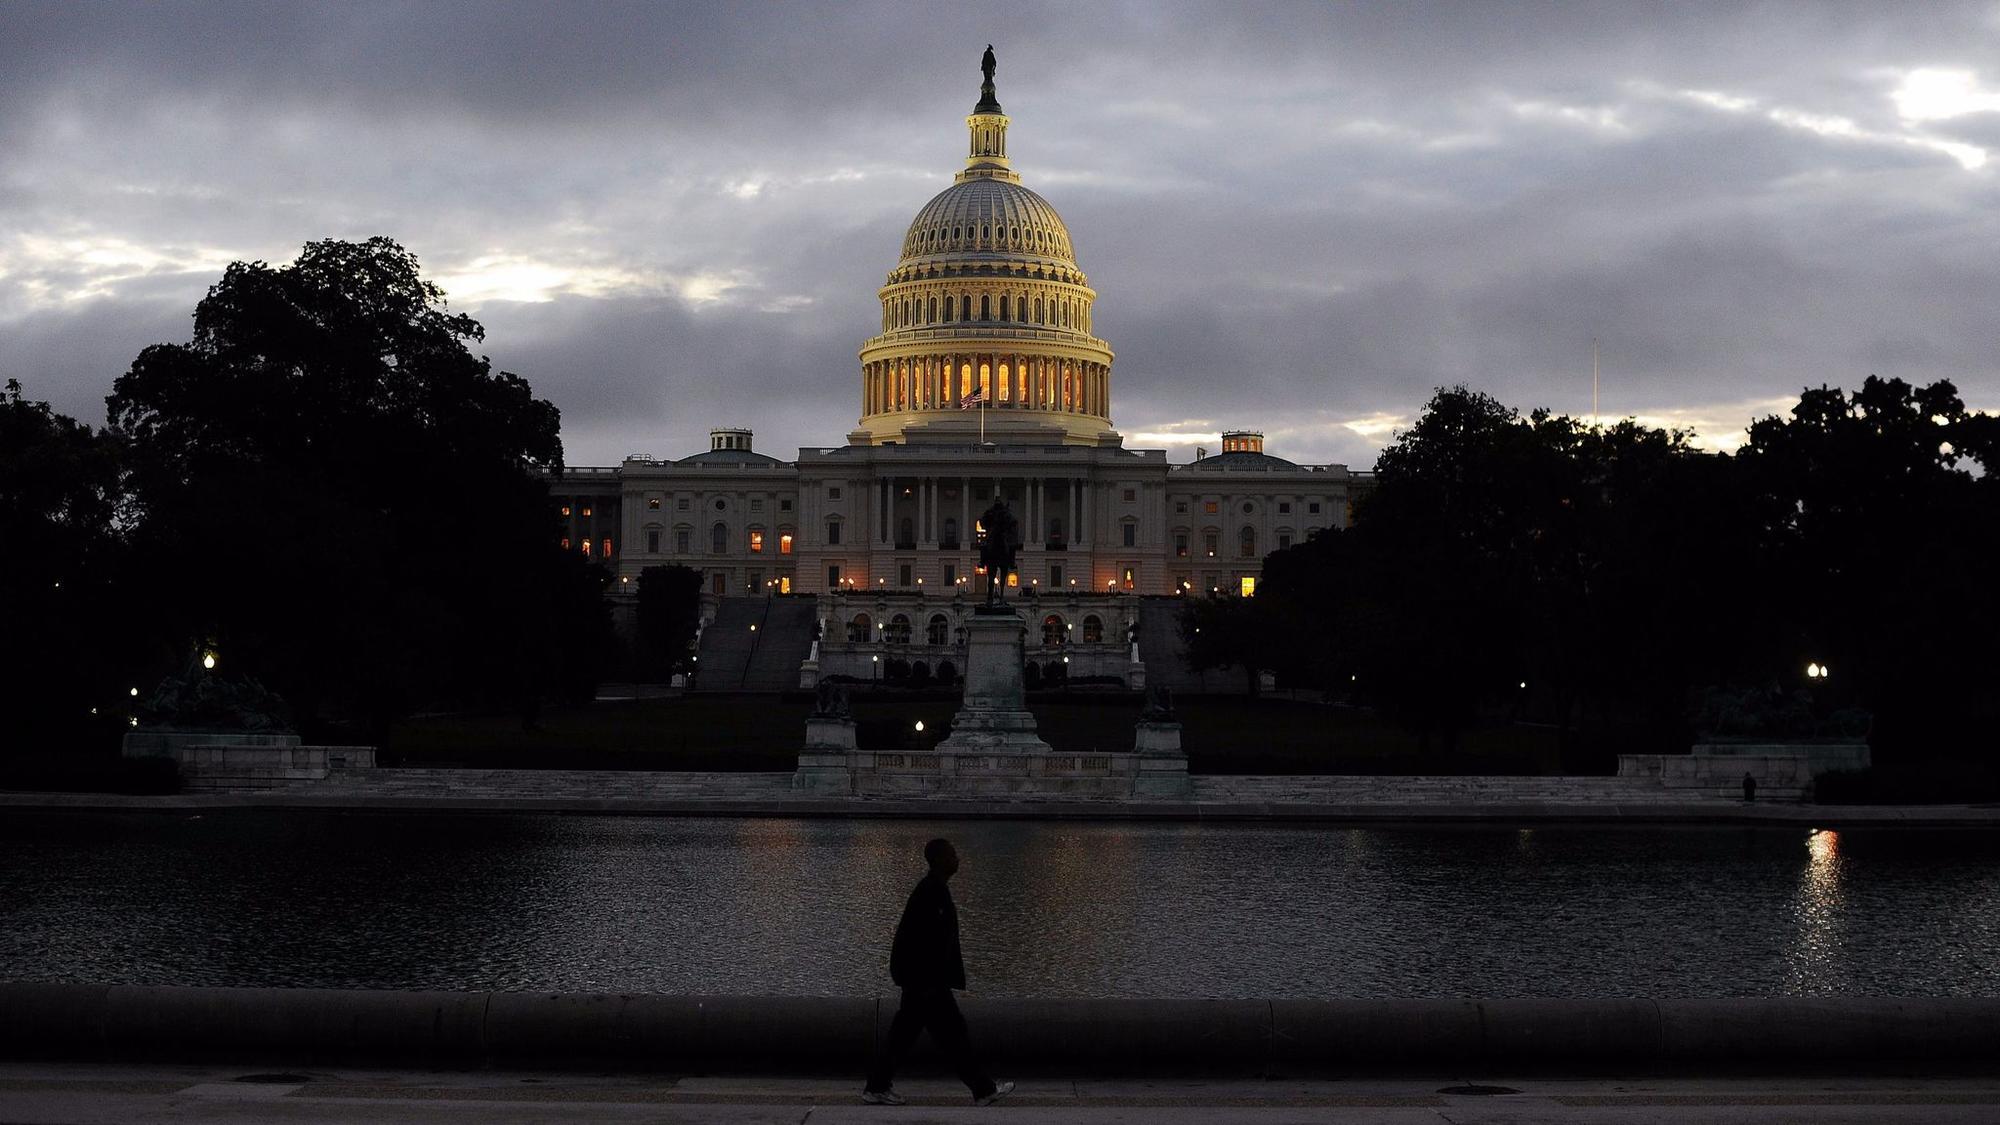 FILES-US-WEATHER-STORM-POLITICS-AID